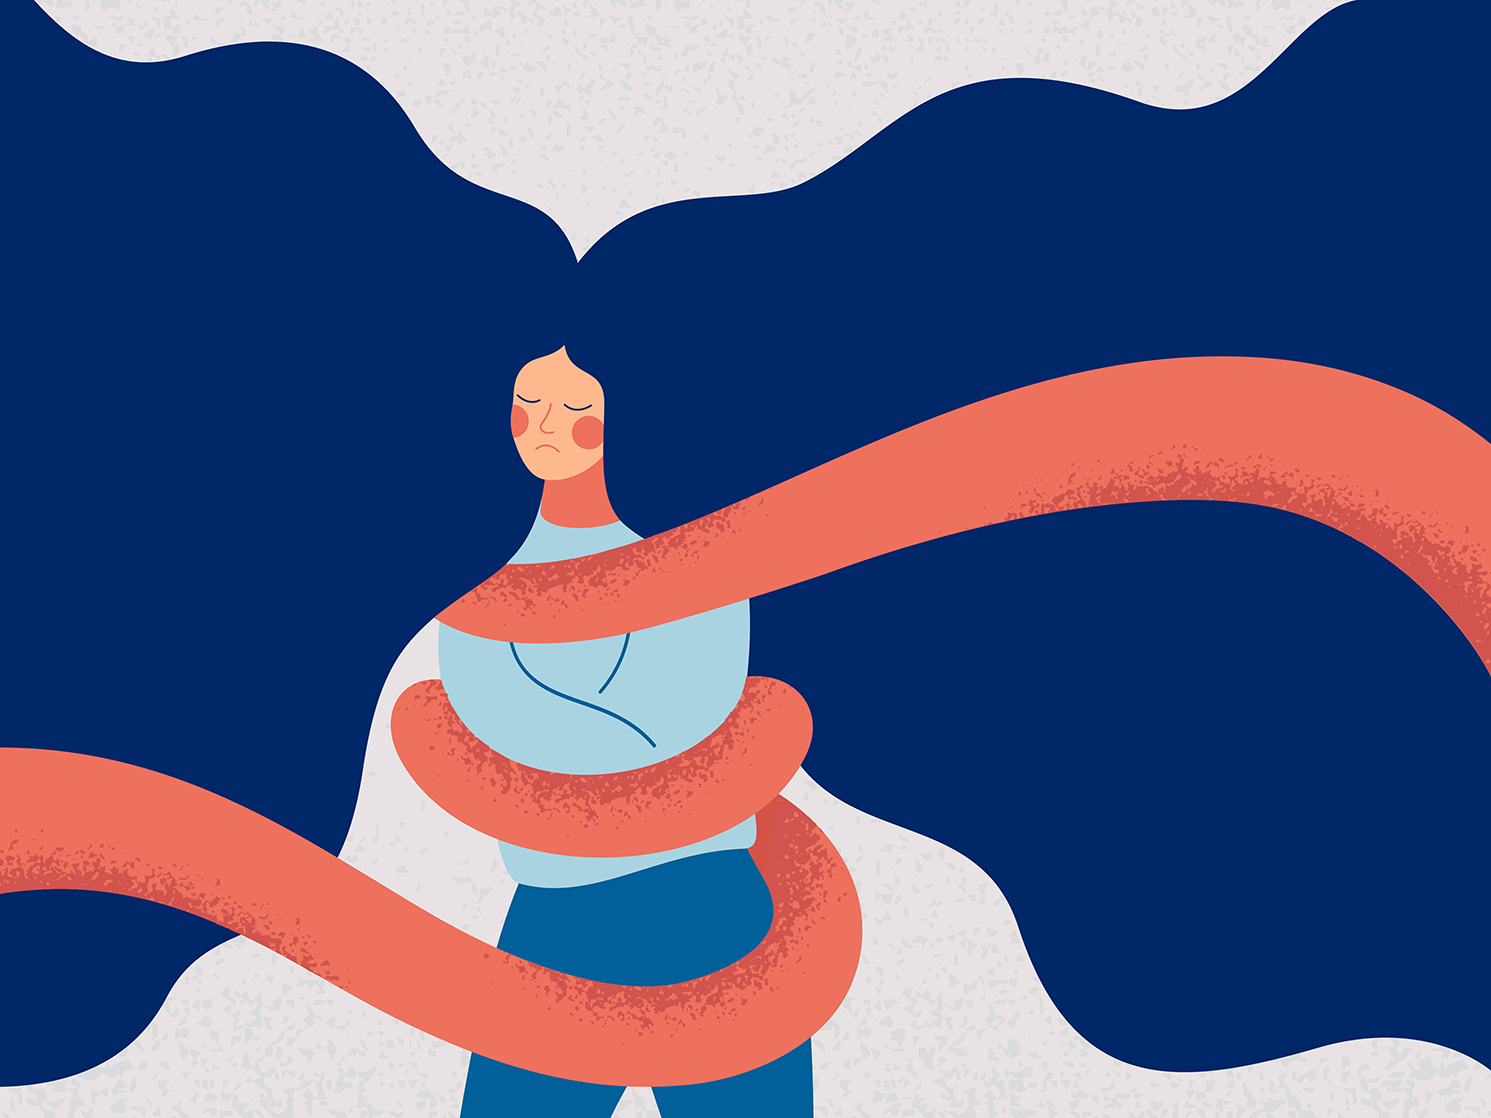 #YoTeCreo: a propósito del escrache feminista